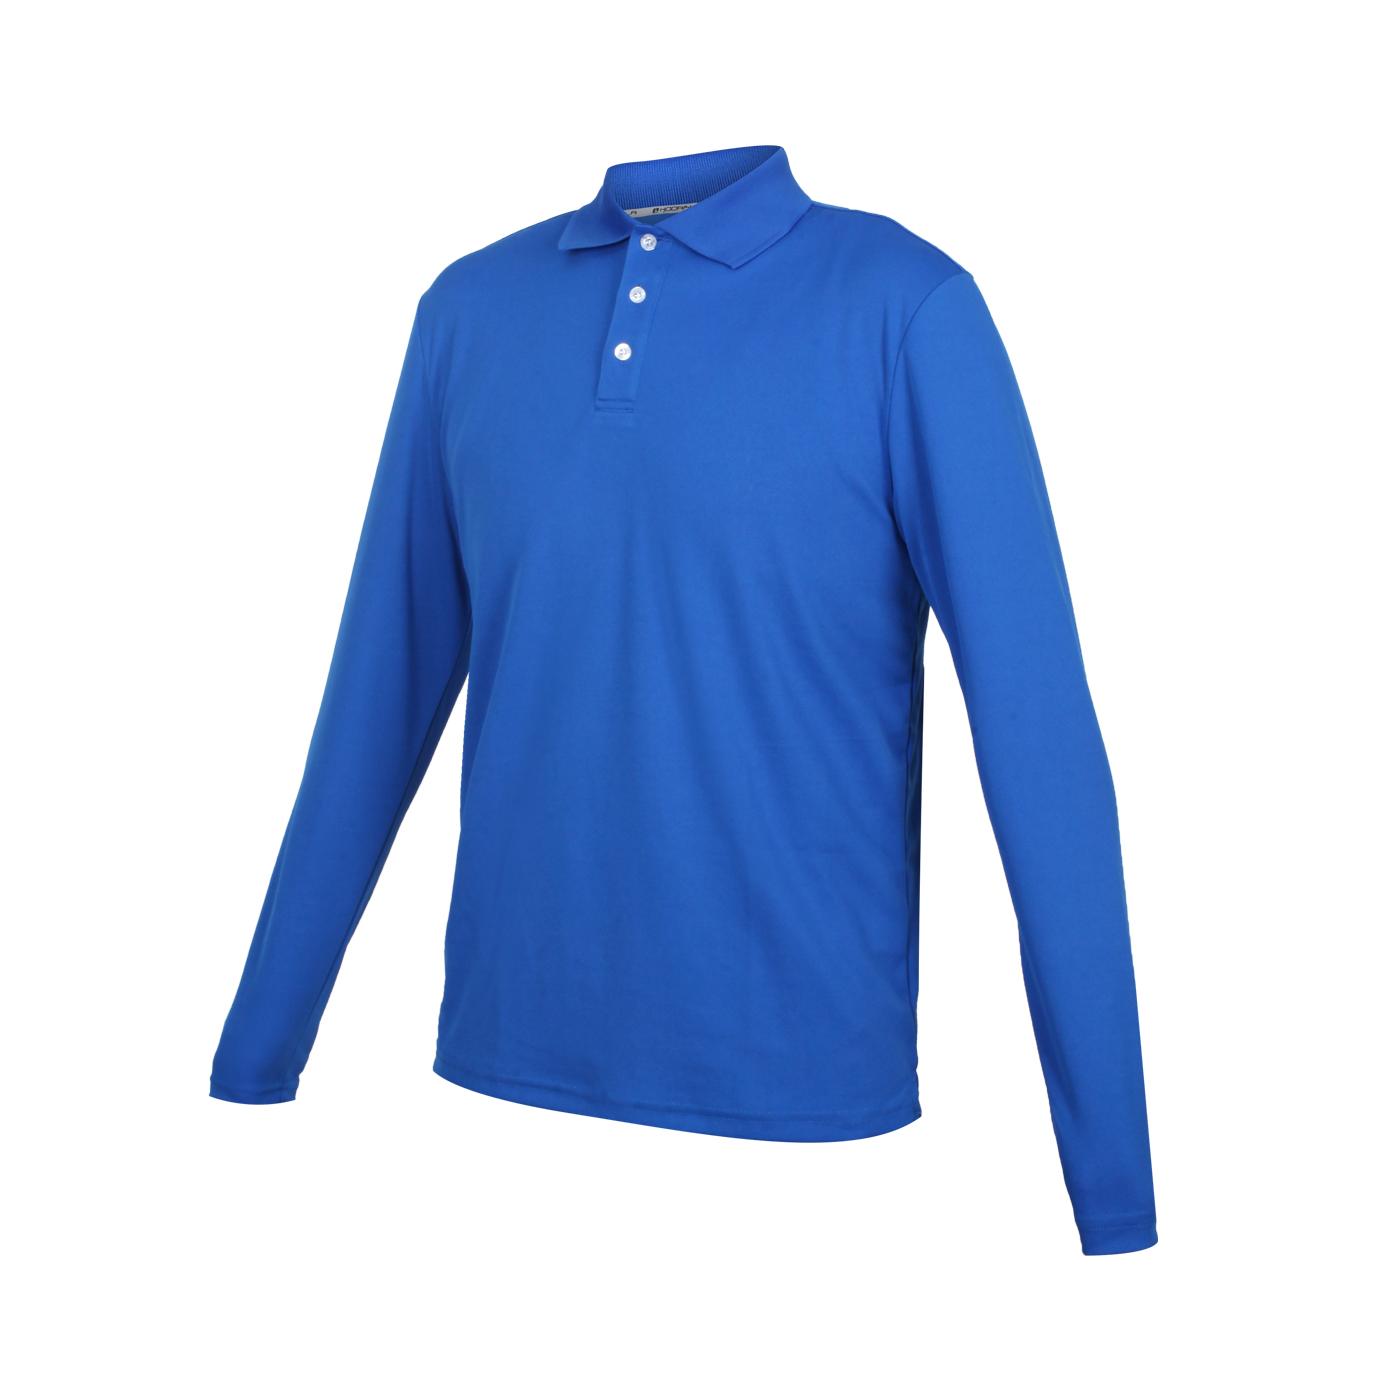 HODARLA 星際吸濕排汗長袖POLO衫 3161301 - 藍